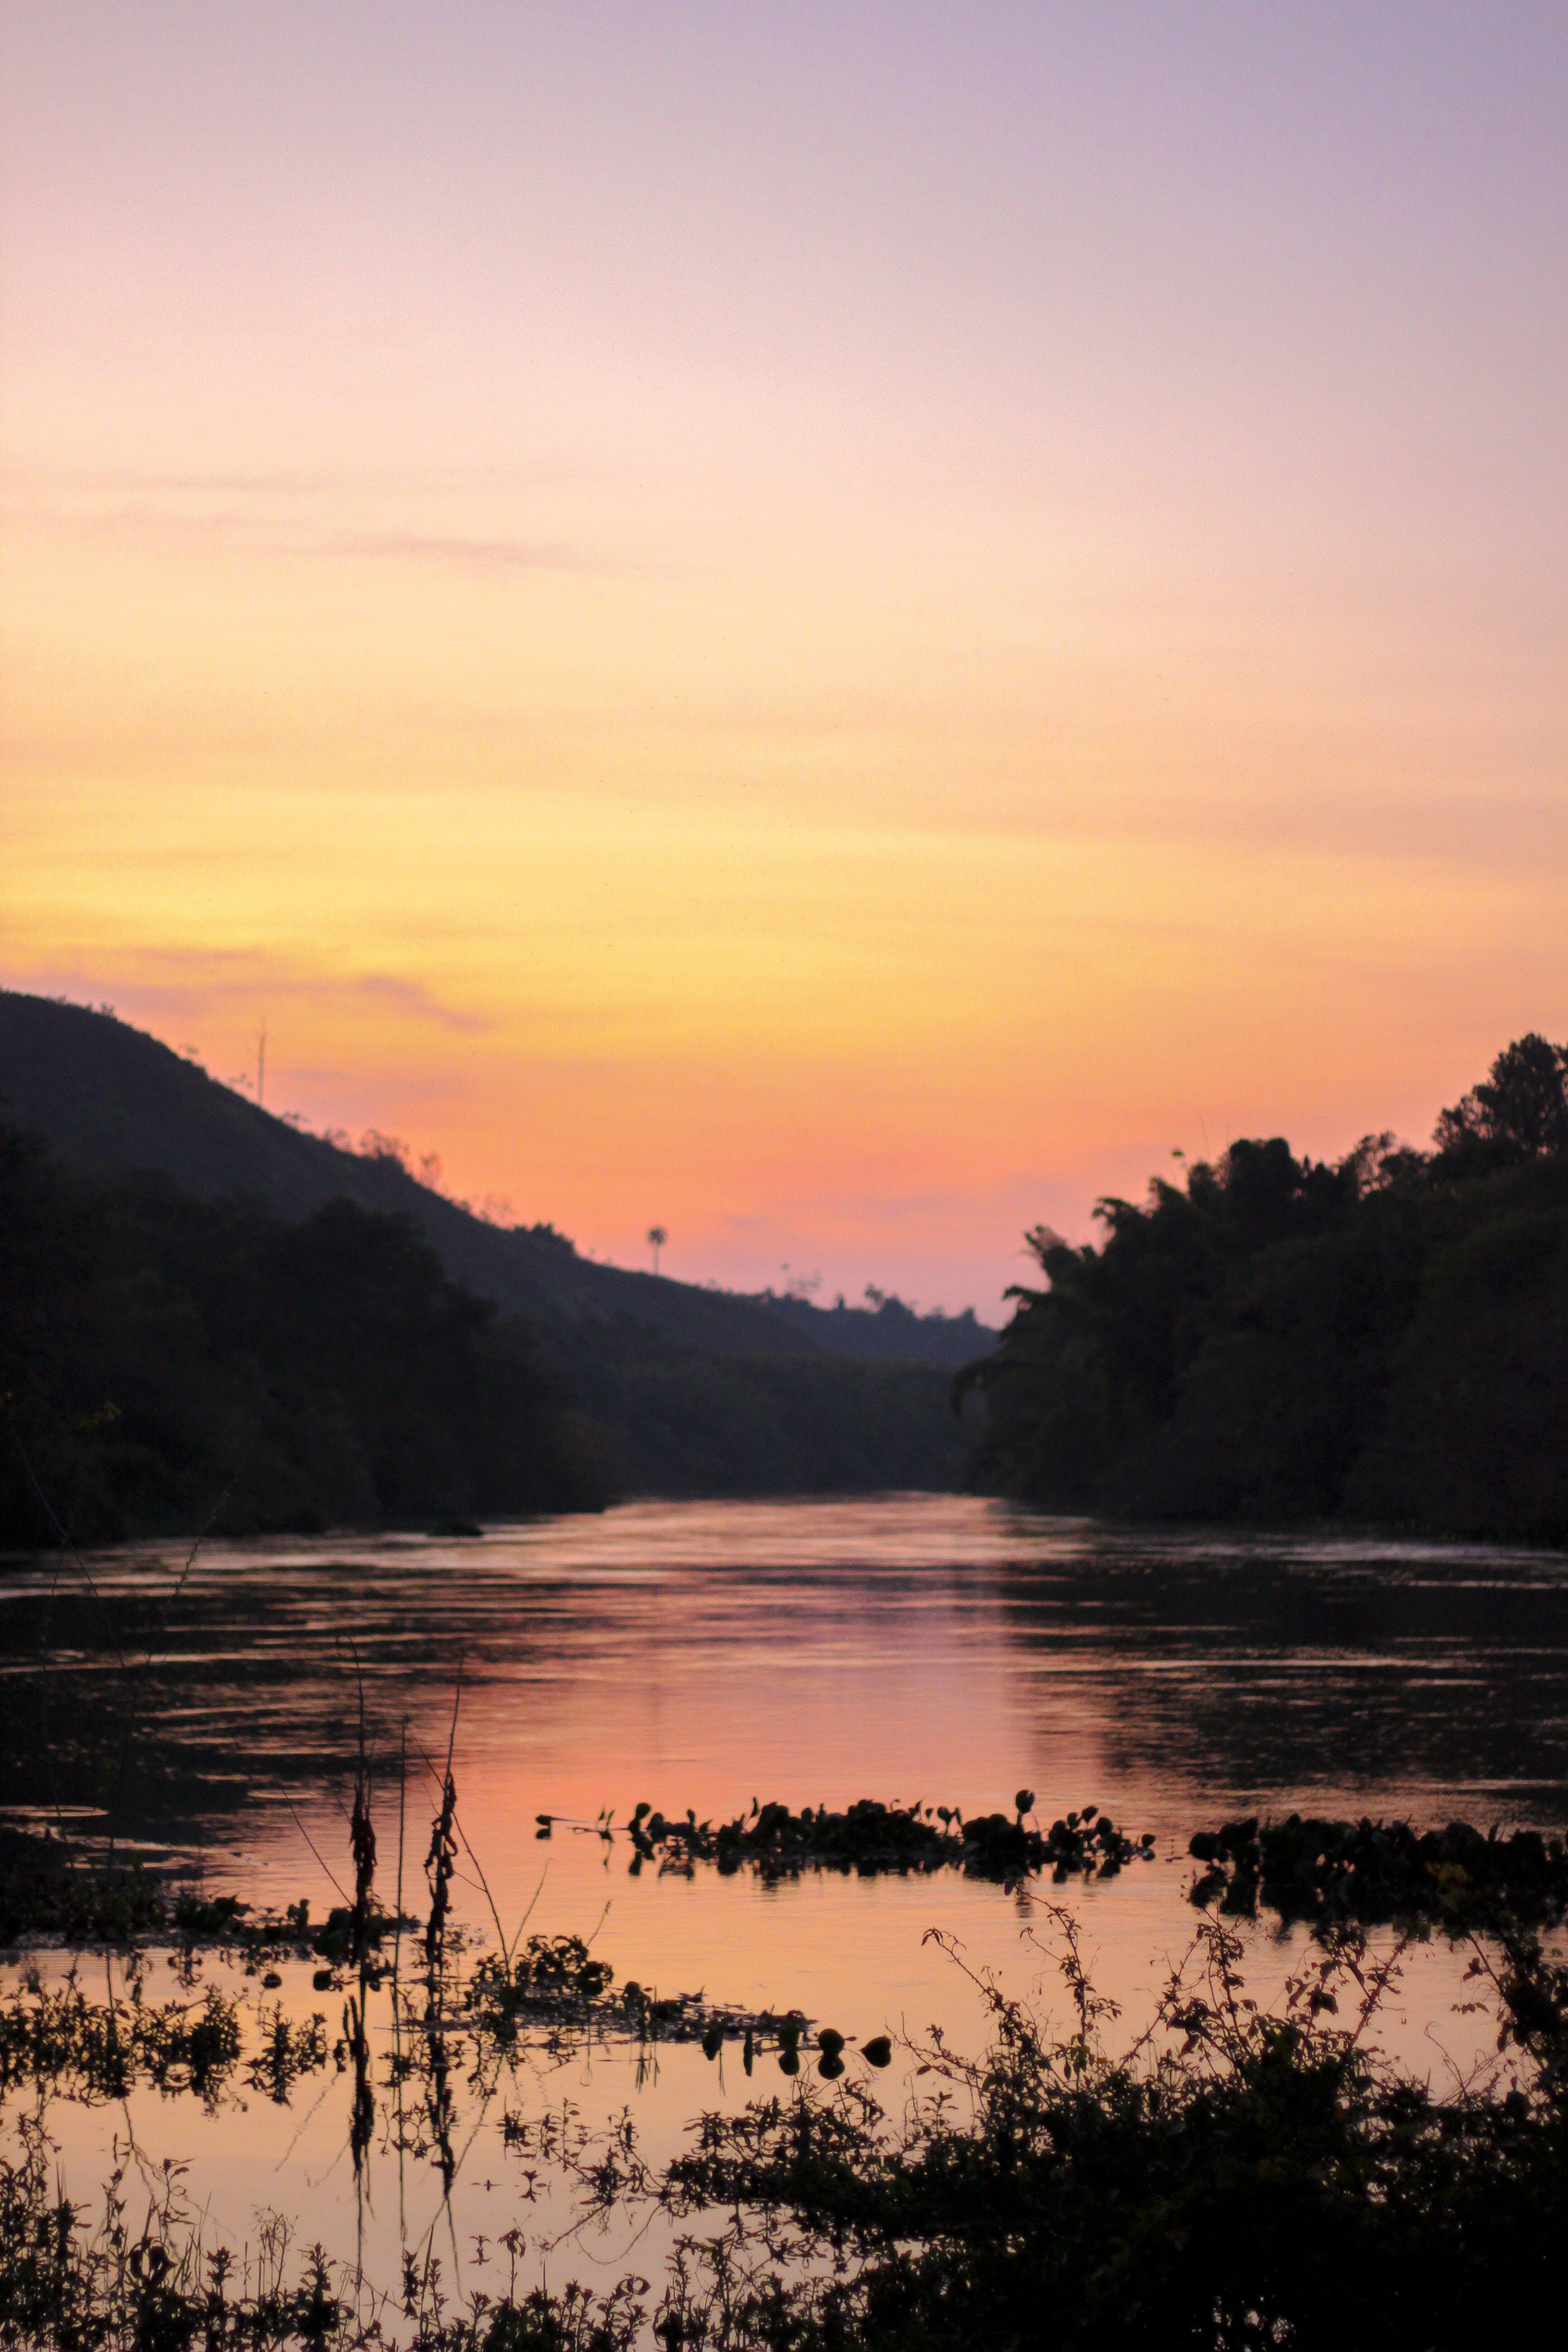 Free stock photo of sunset, sun, river, golden sun